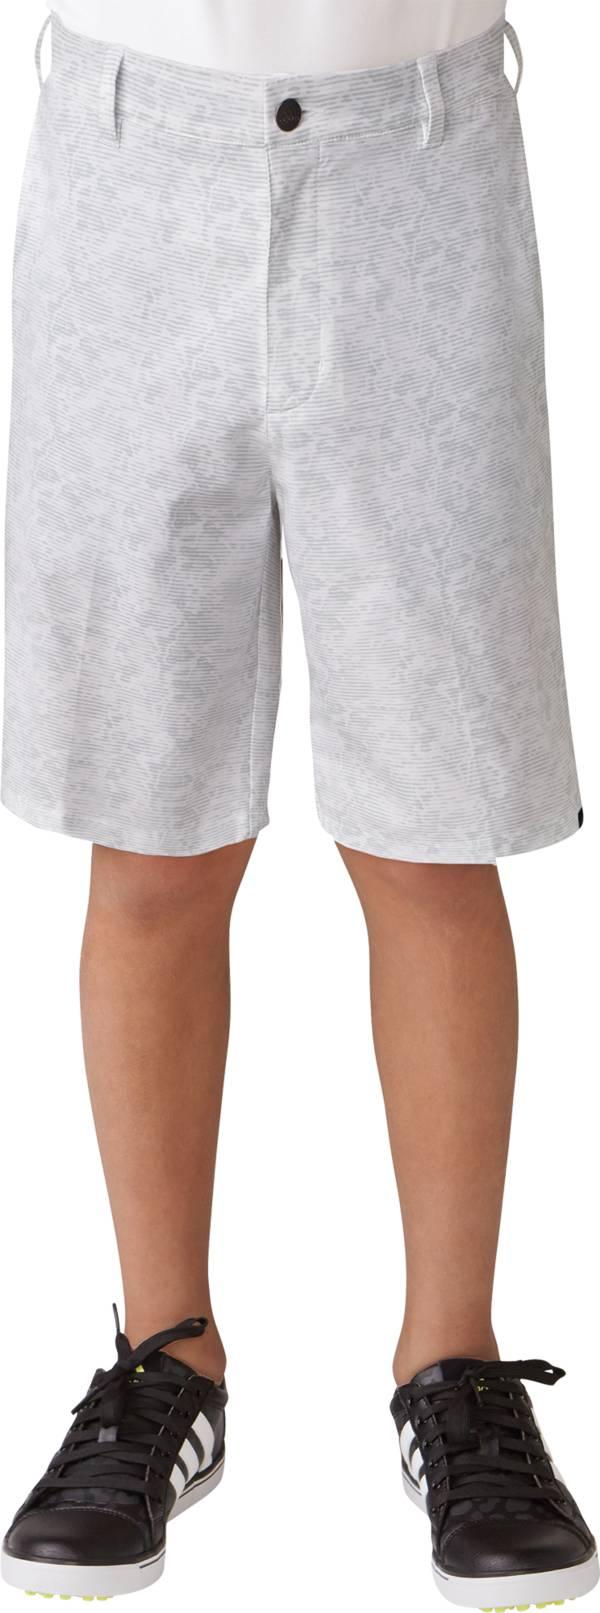 adidas Boys' Ultimate365 Camo Golf Shorts product image